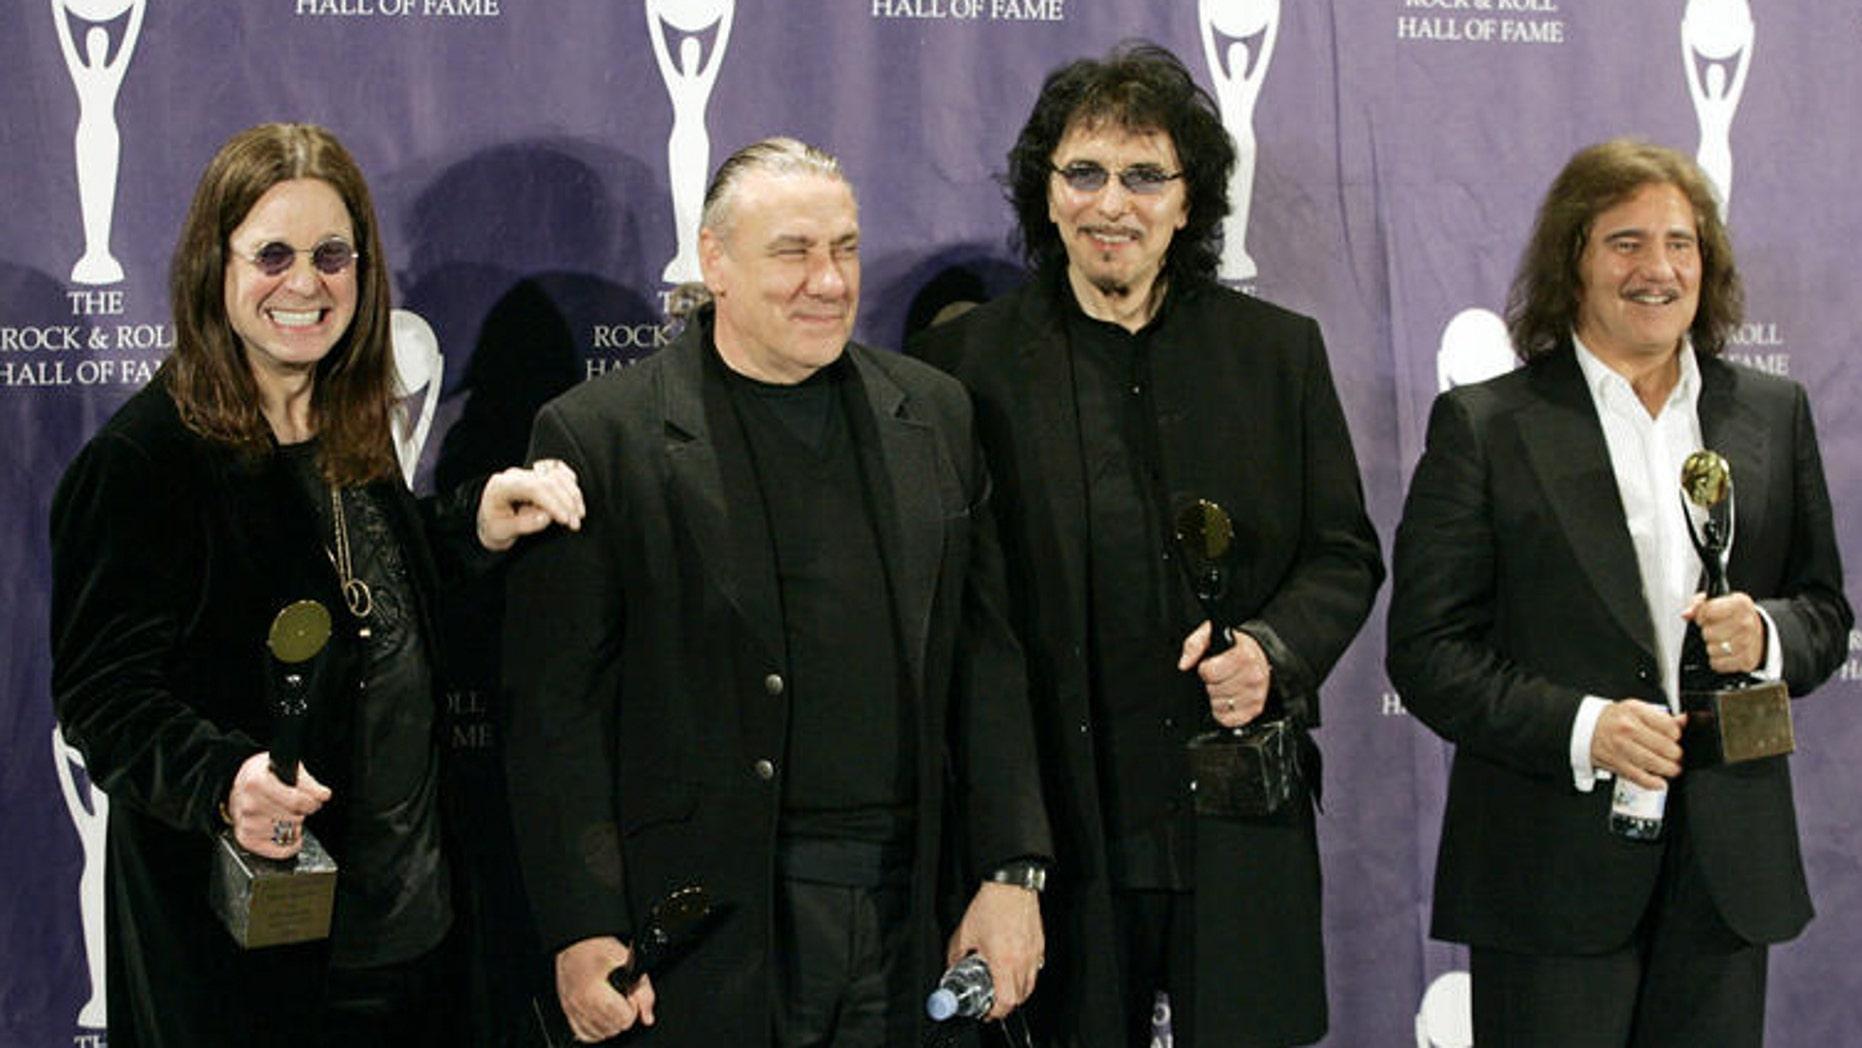 Black Sabbath: (r to l) Ozzy Osbourne, Bill Ward, Tony Iommi and Geezer Butler.